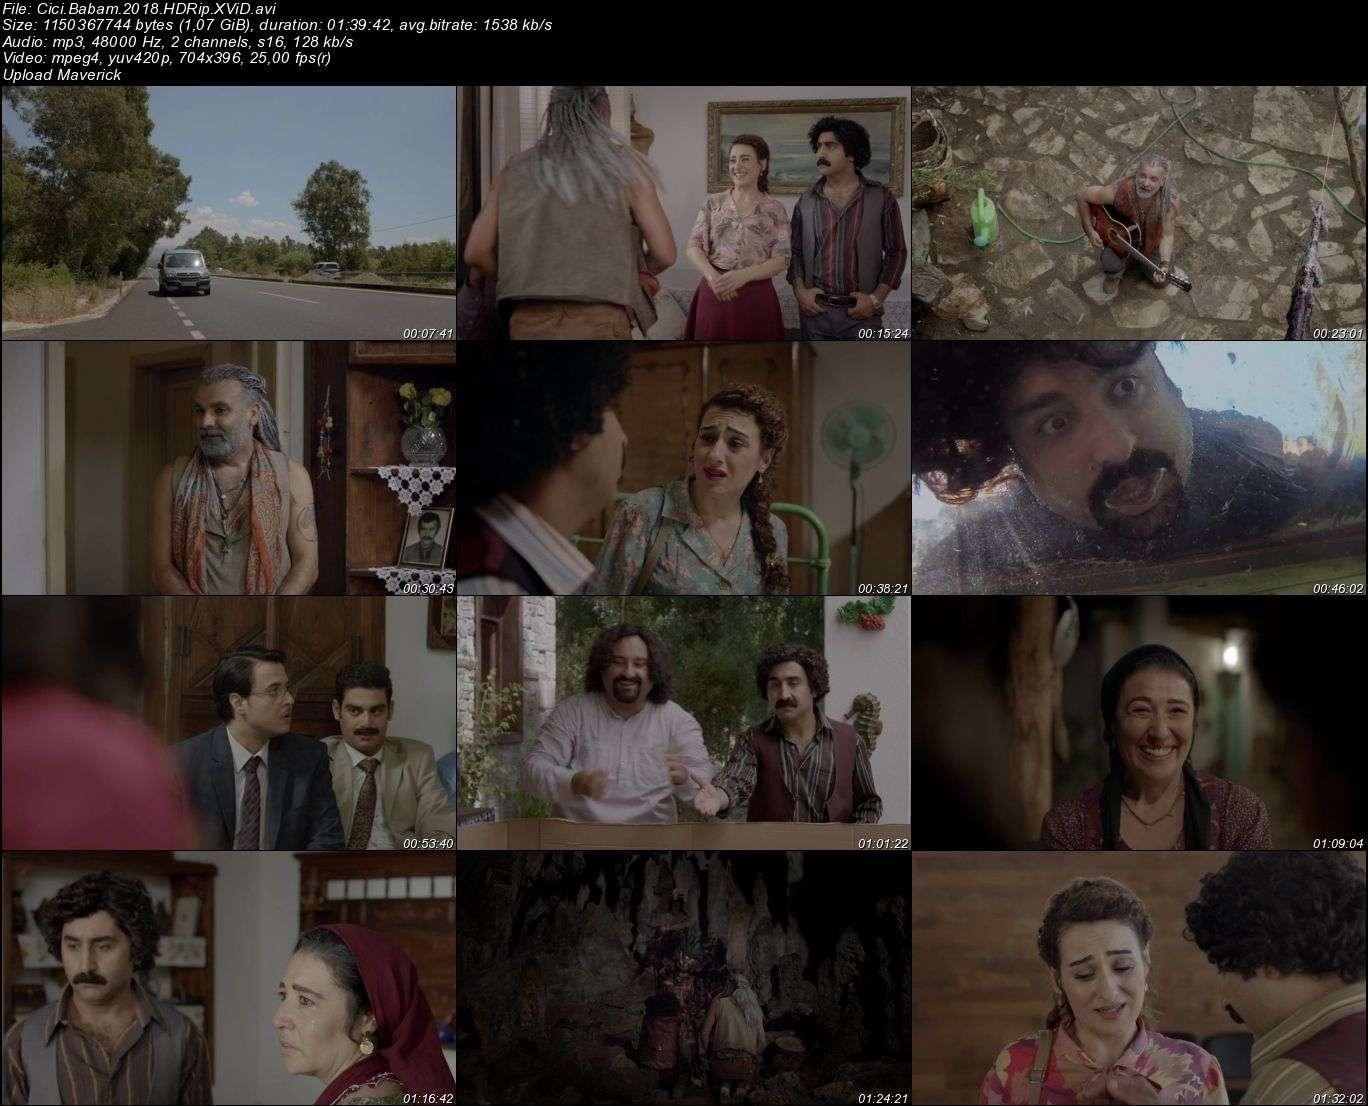 Cici Babam - 2018 (Yerli Film) HDRip XviD indir